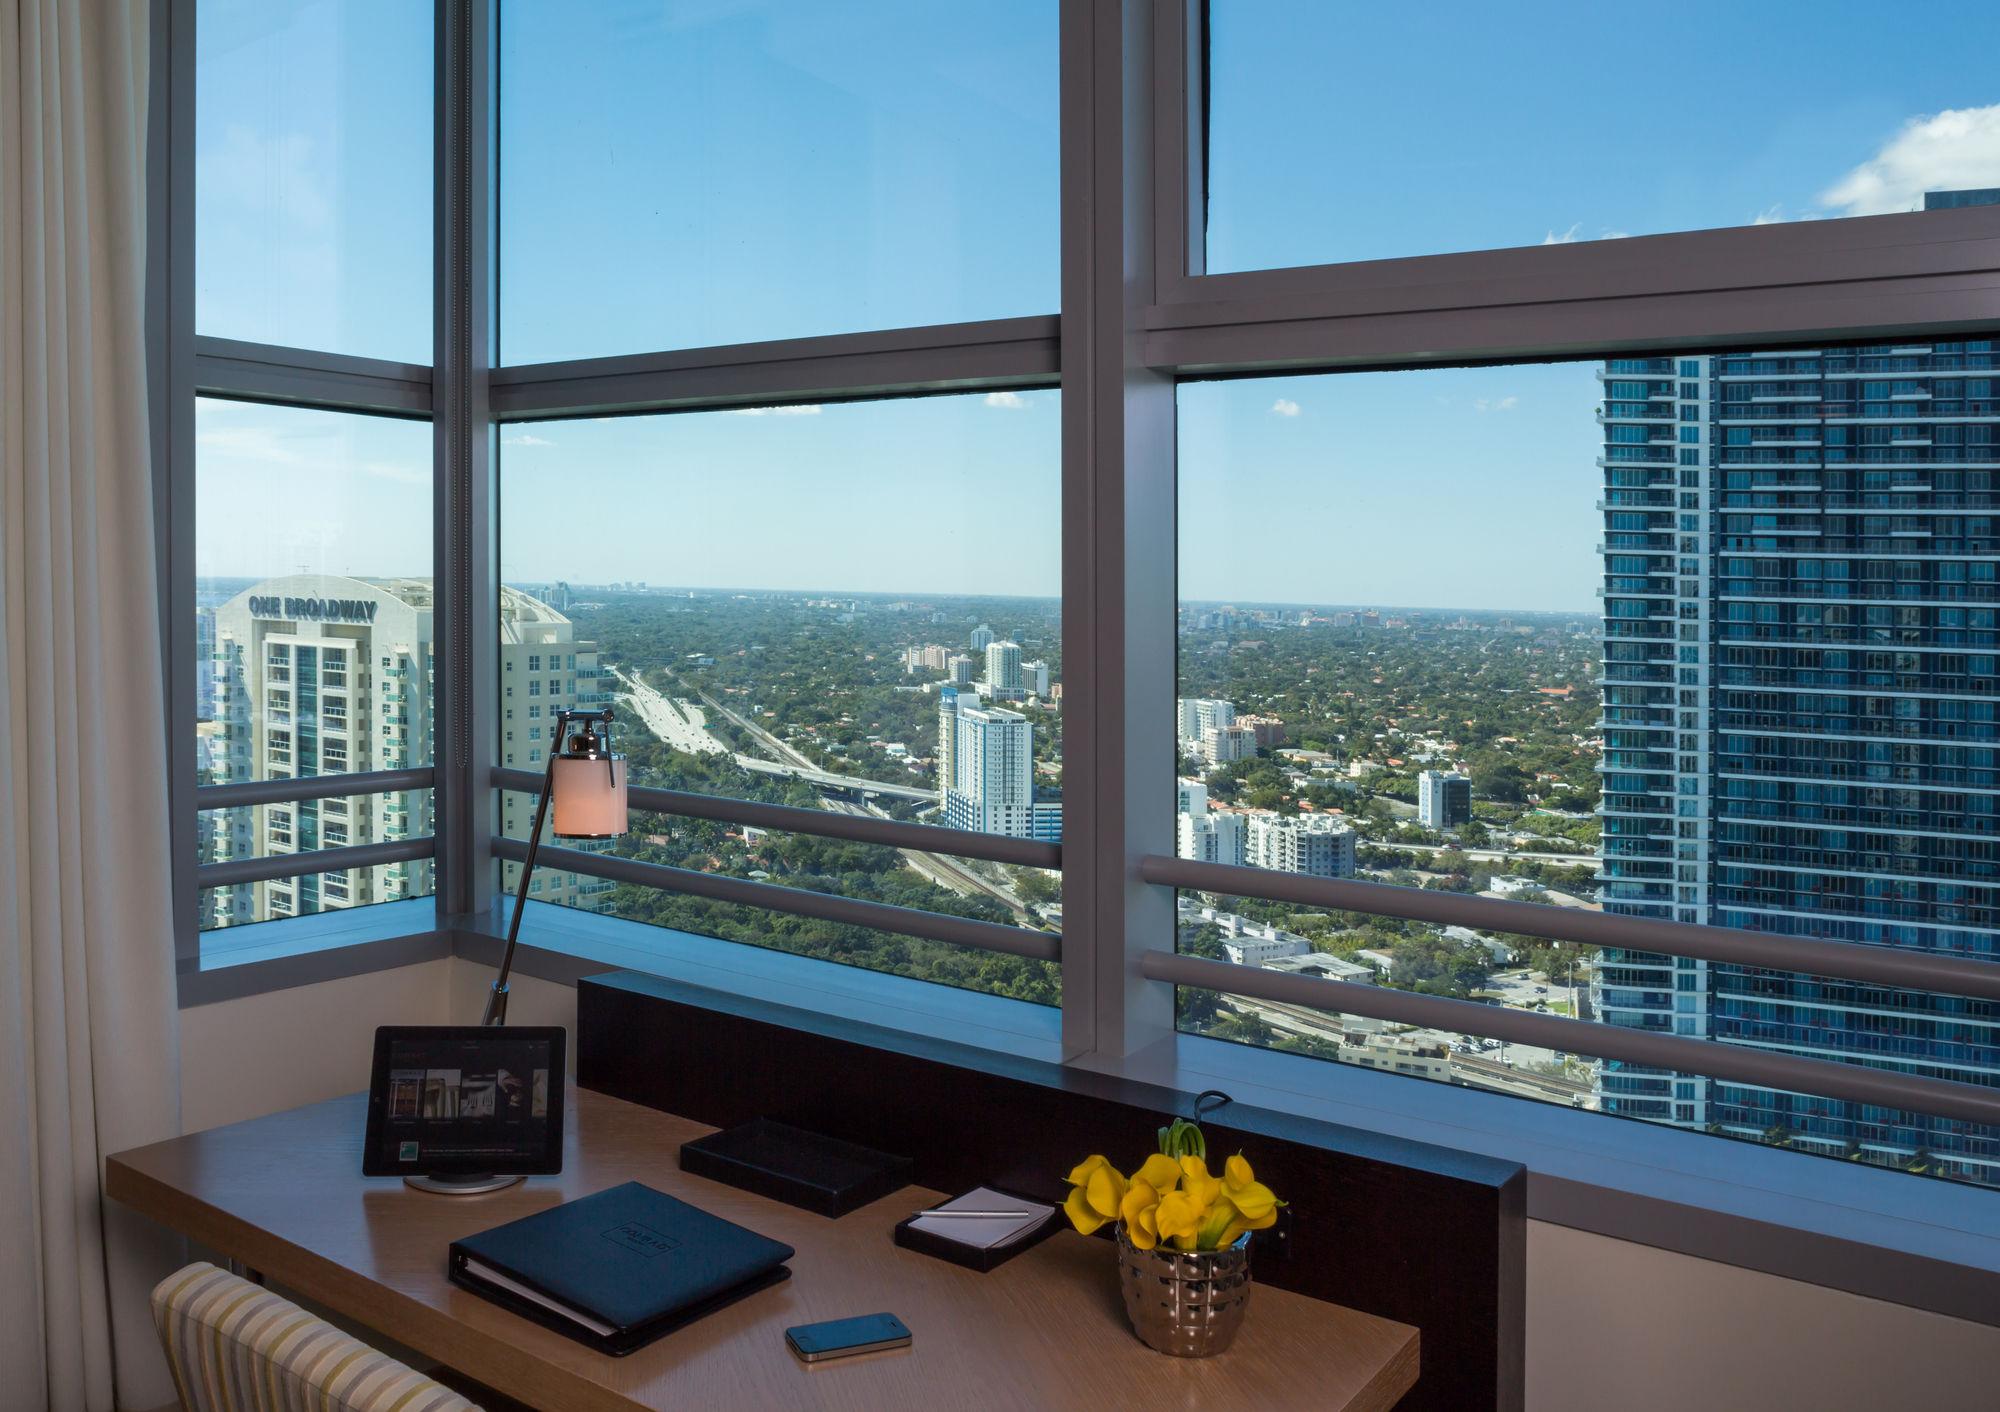 Miami Hotel Coupons for Miami Florida FreeHotelCouponscom